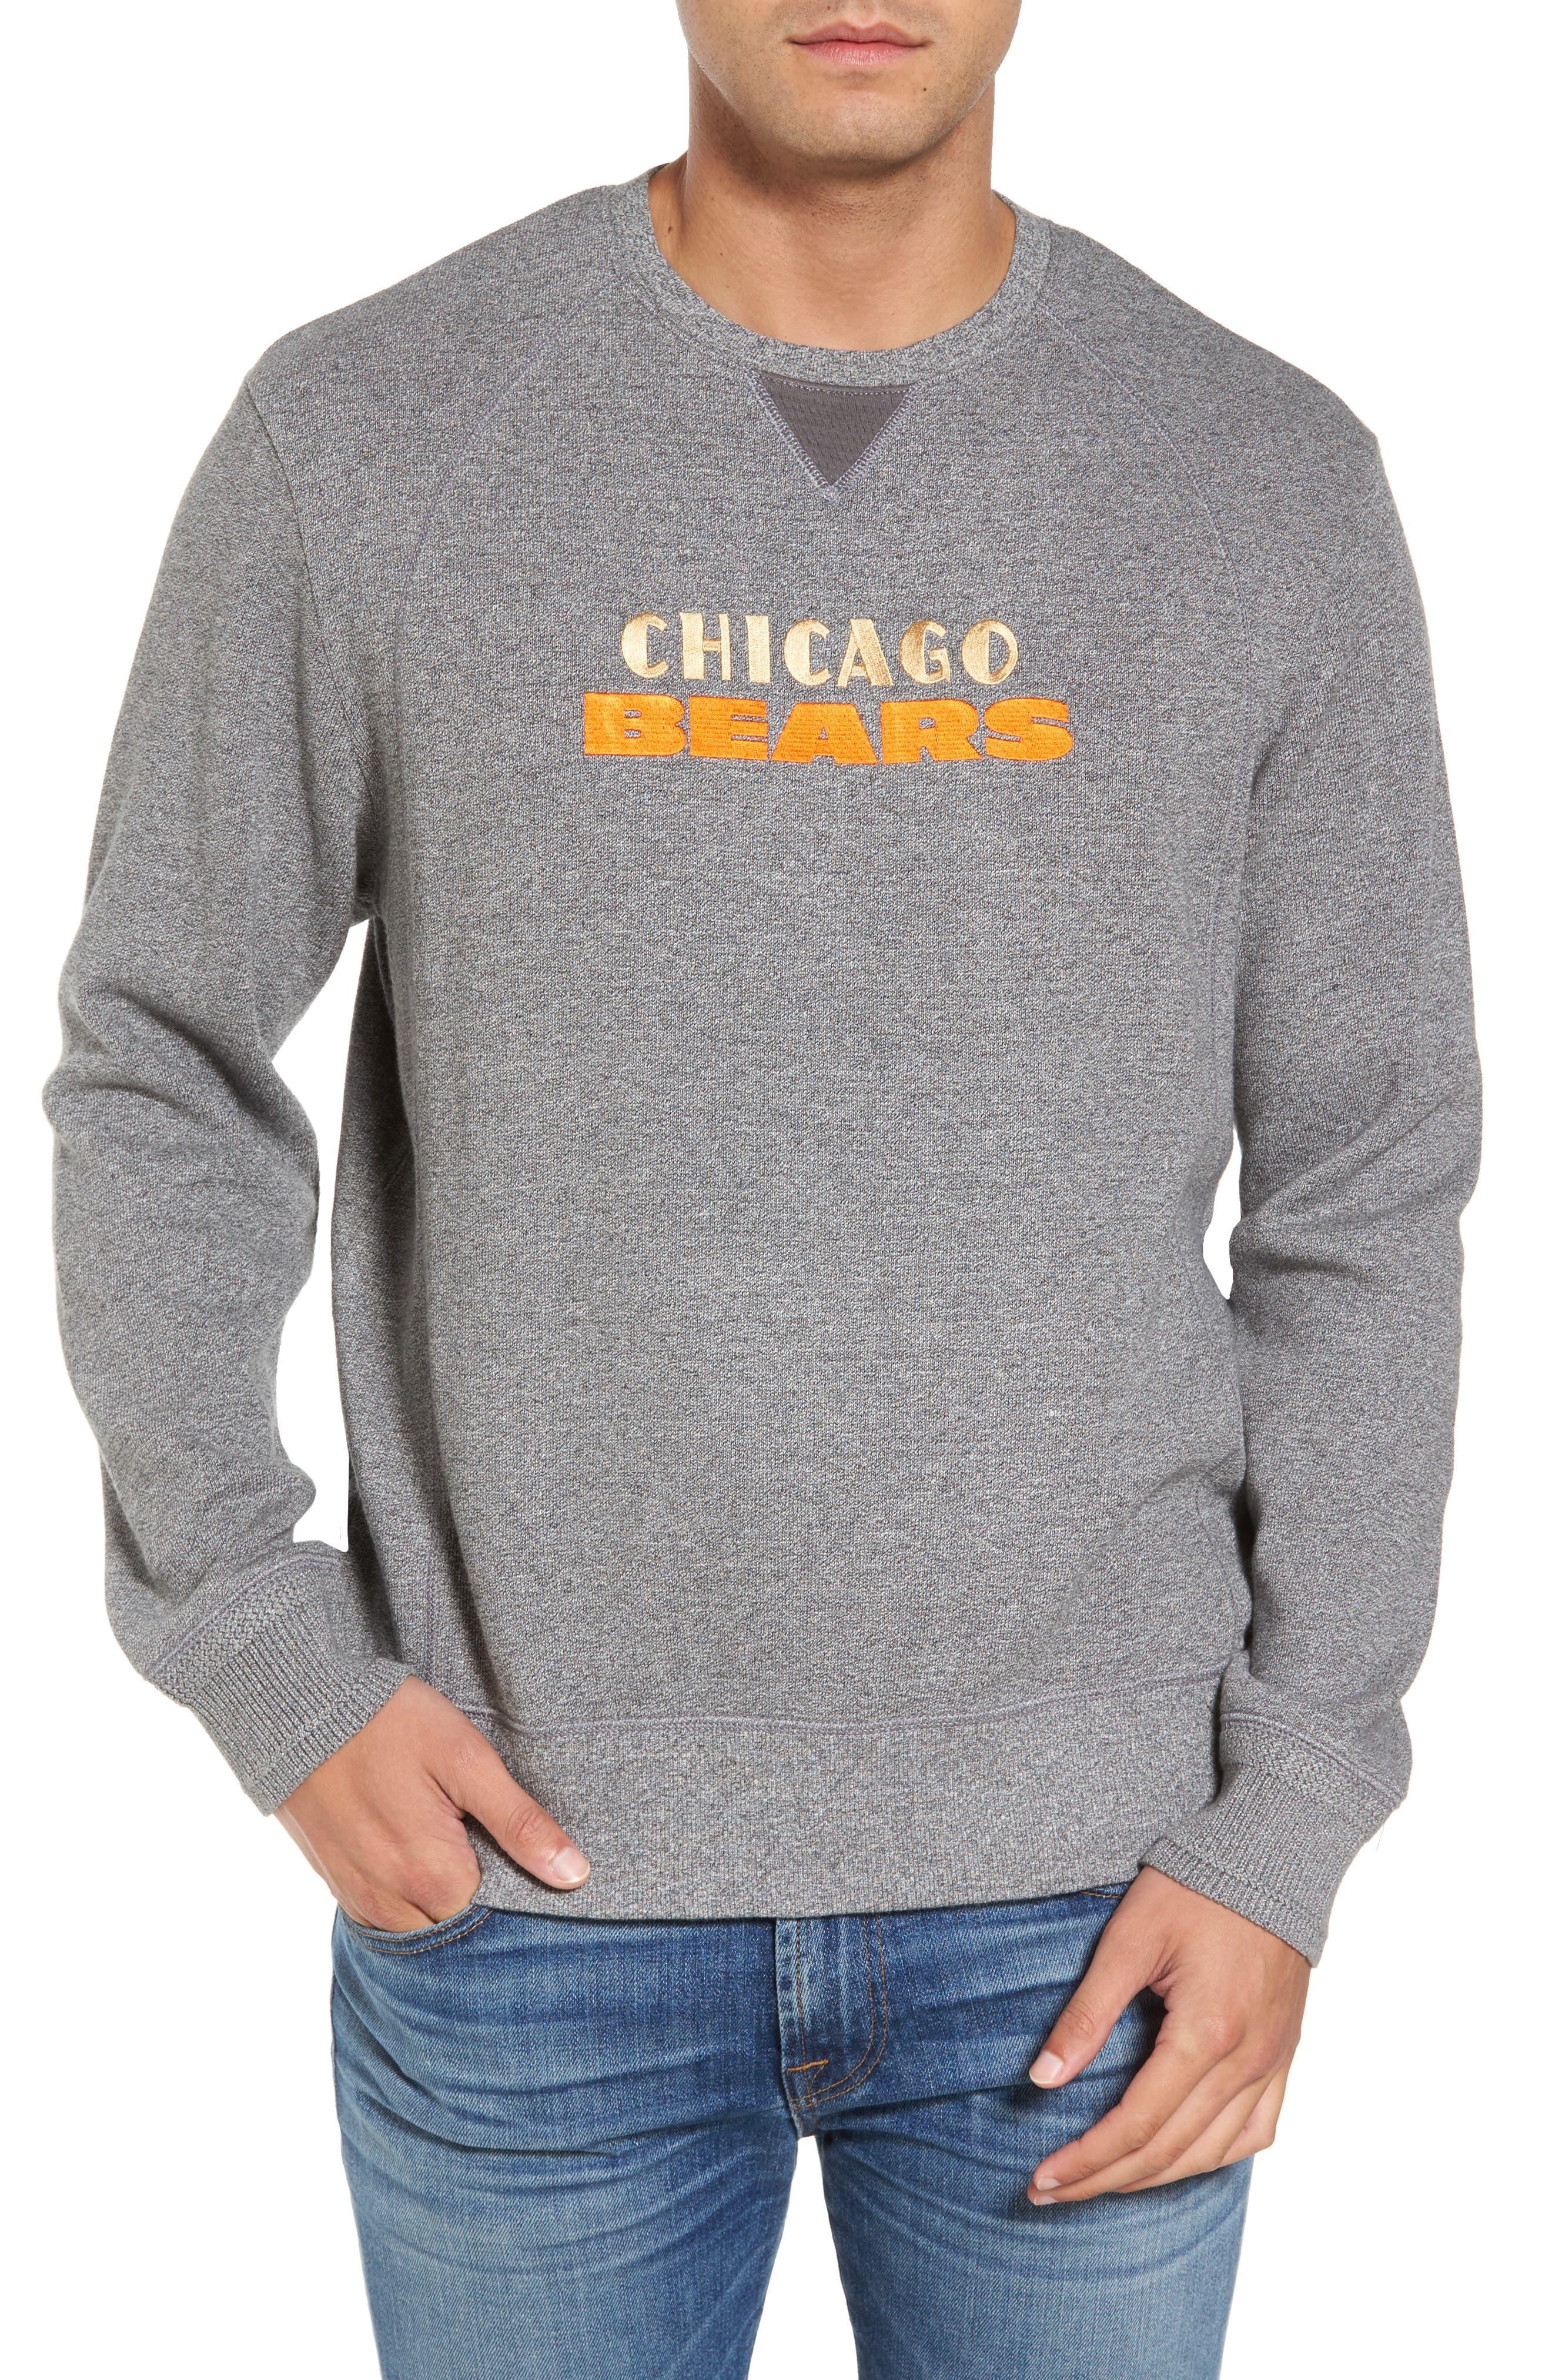 NFL Stitch of Liberty Embroidered Crewneck Sweatshirt,                             Main thumbnail 3, color,